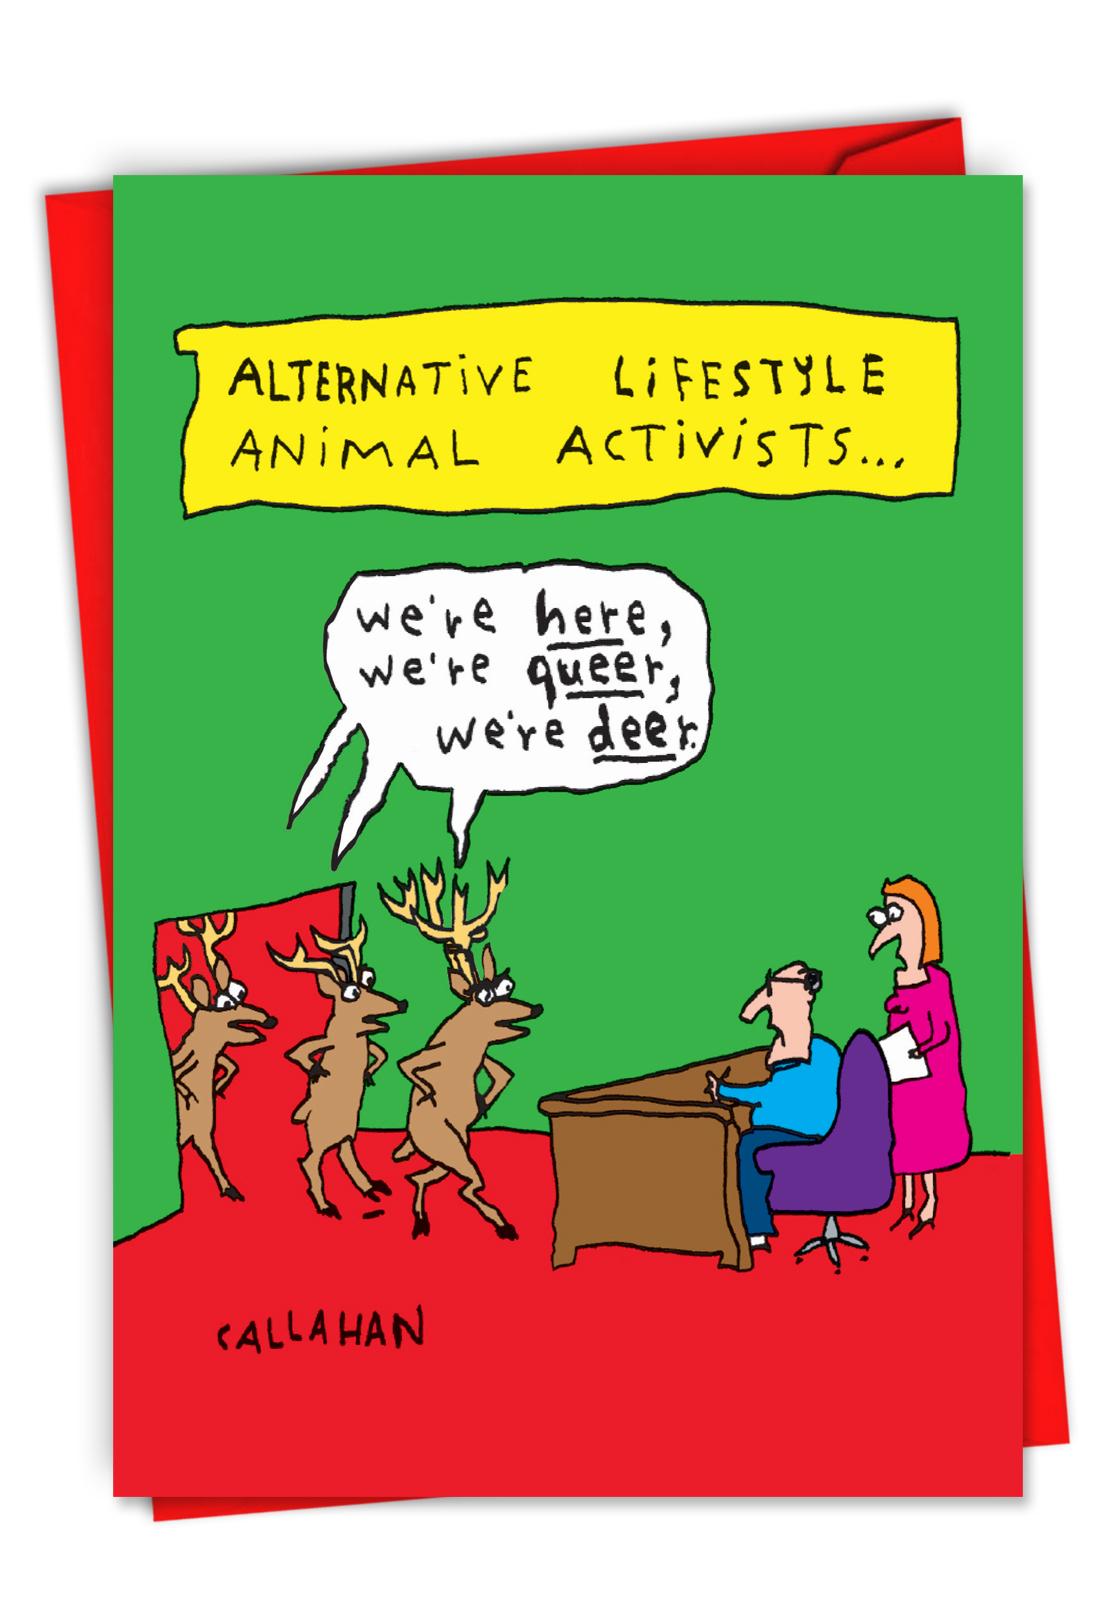 new humorous christmas card from nobleworks features the artwork of famed quadriplegic cartoonist john callahan - Humorous Christmas Cards